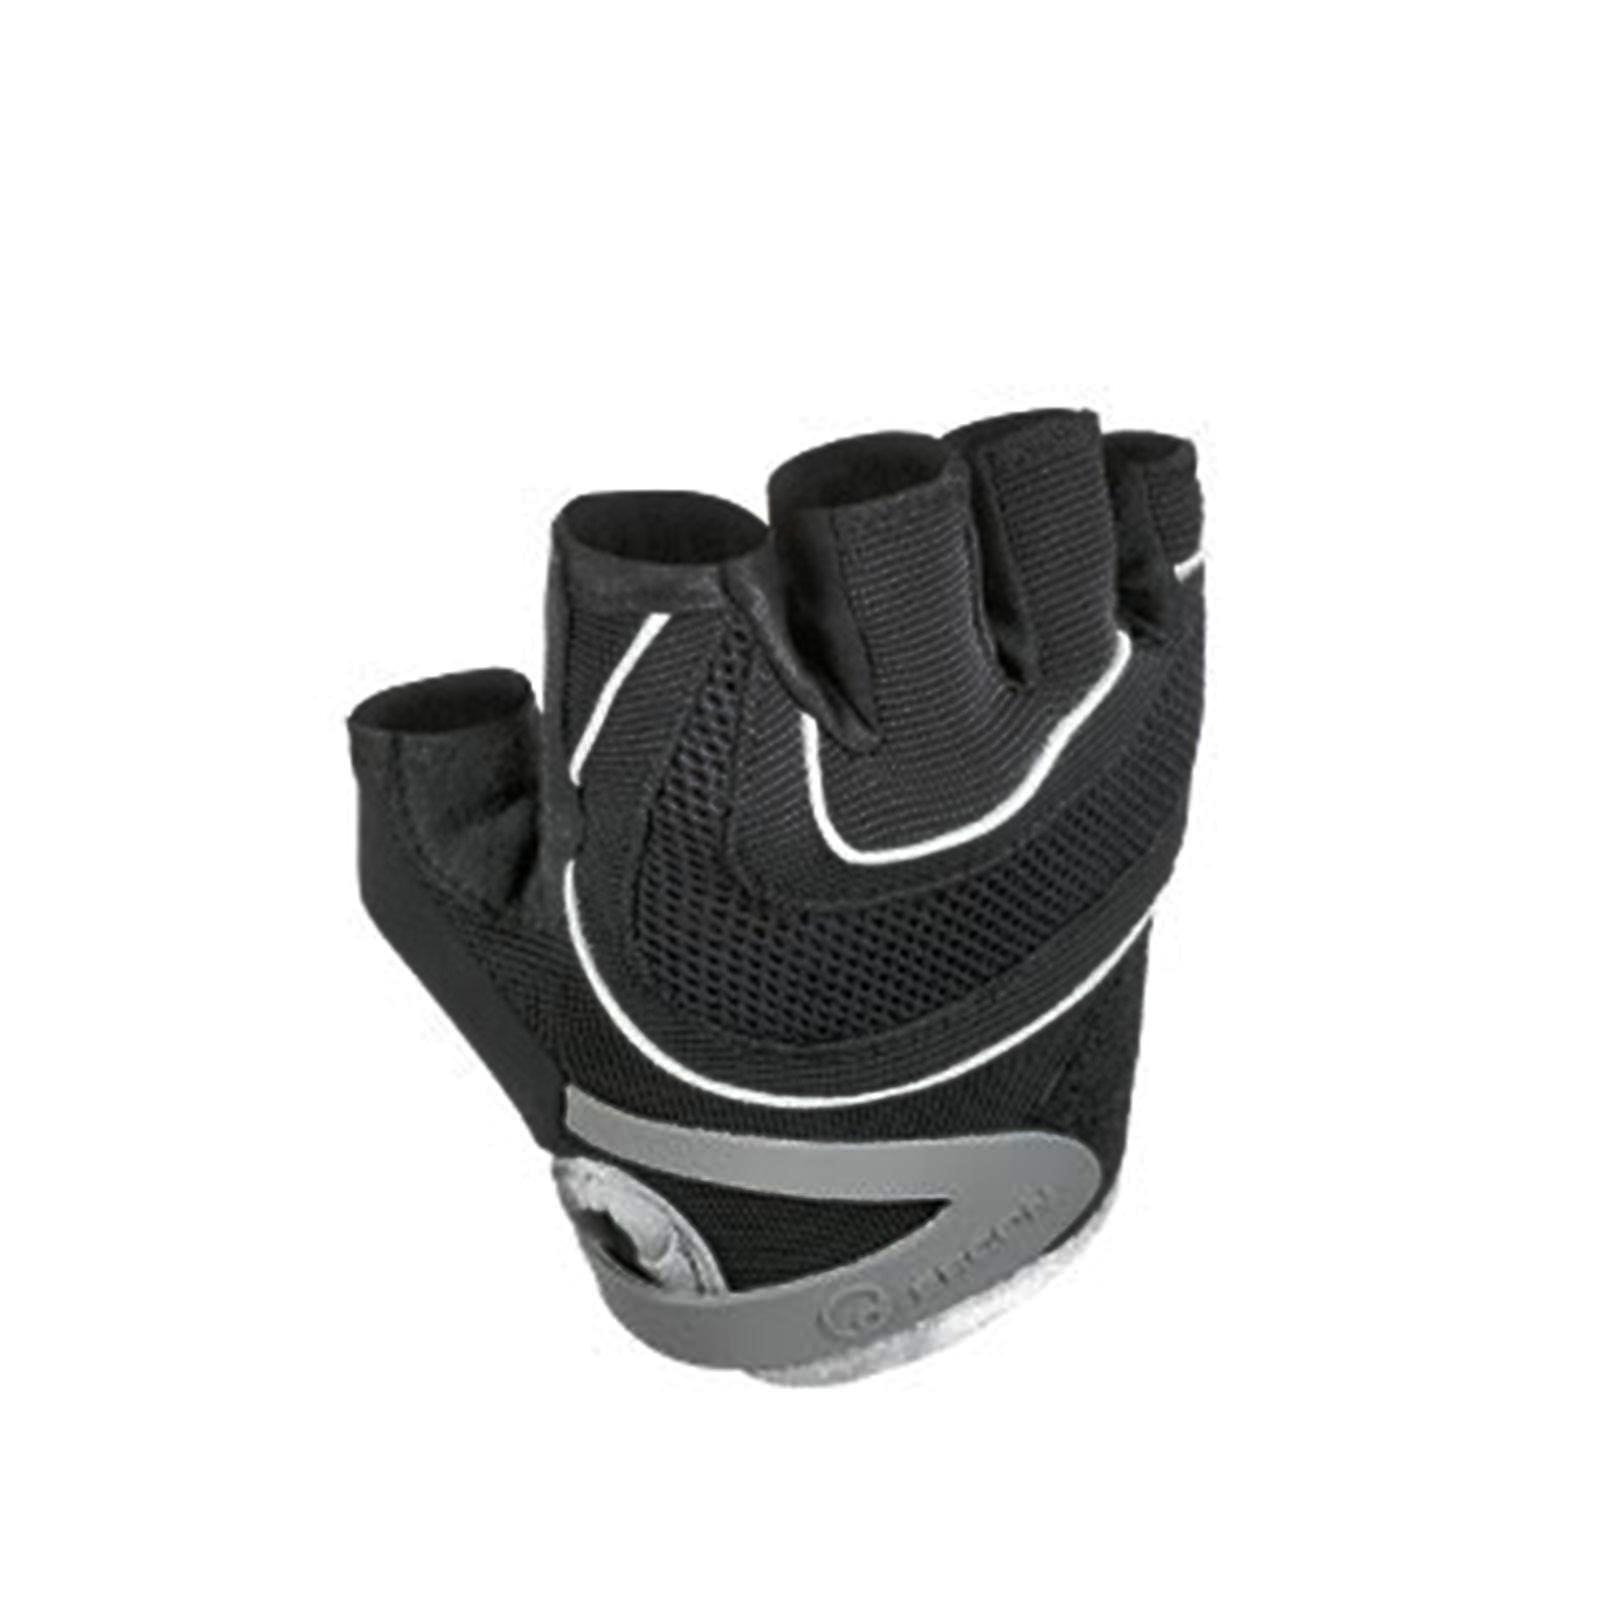 ergon damen herren fahrrad kinder handschuhe passform. Black Bedroom Furniture Sets. Home Design Ideas